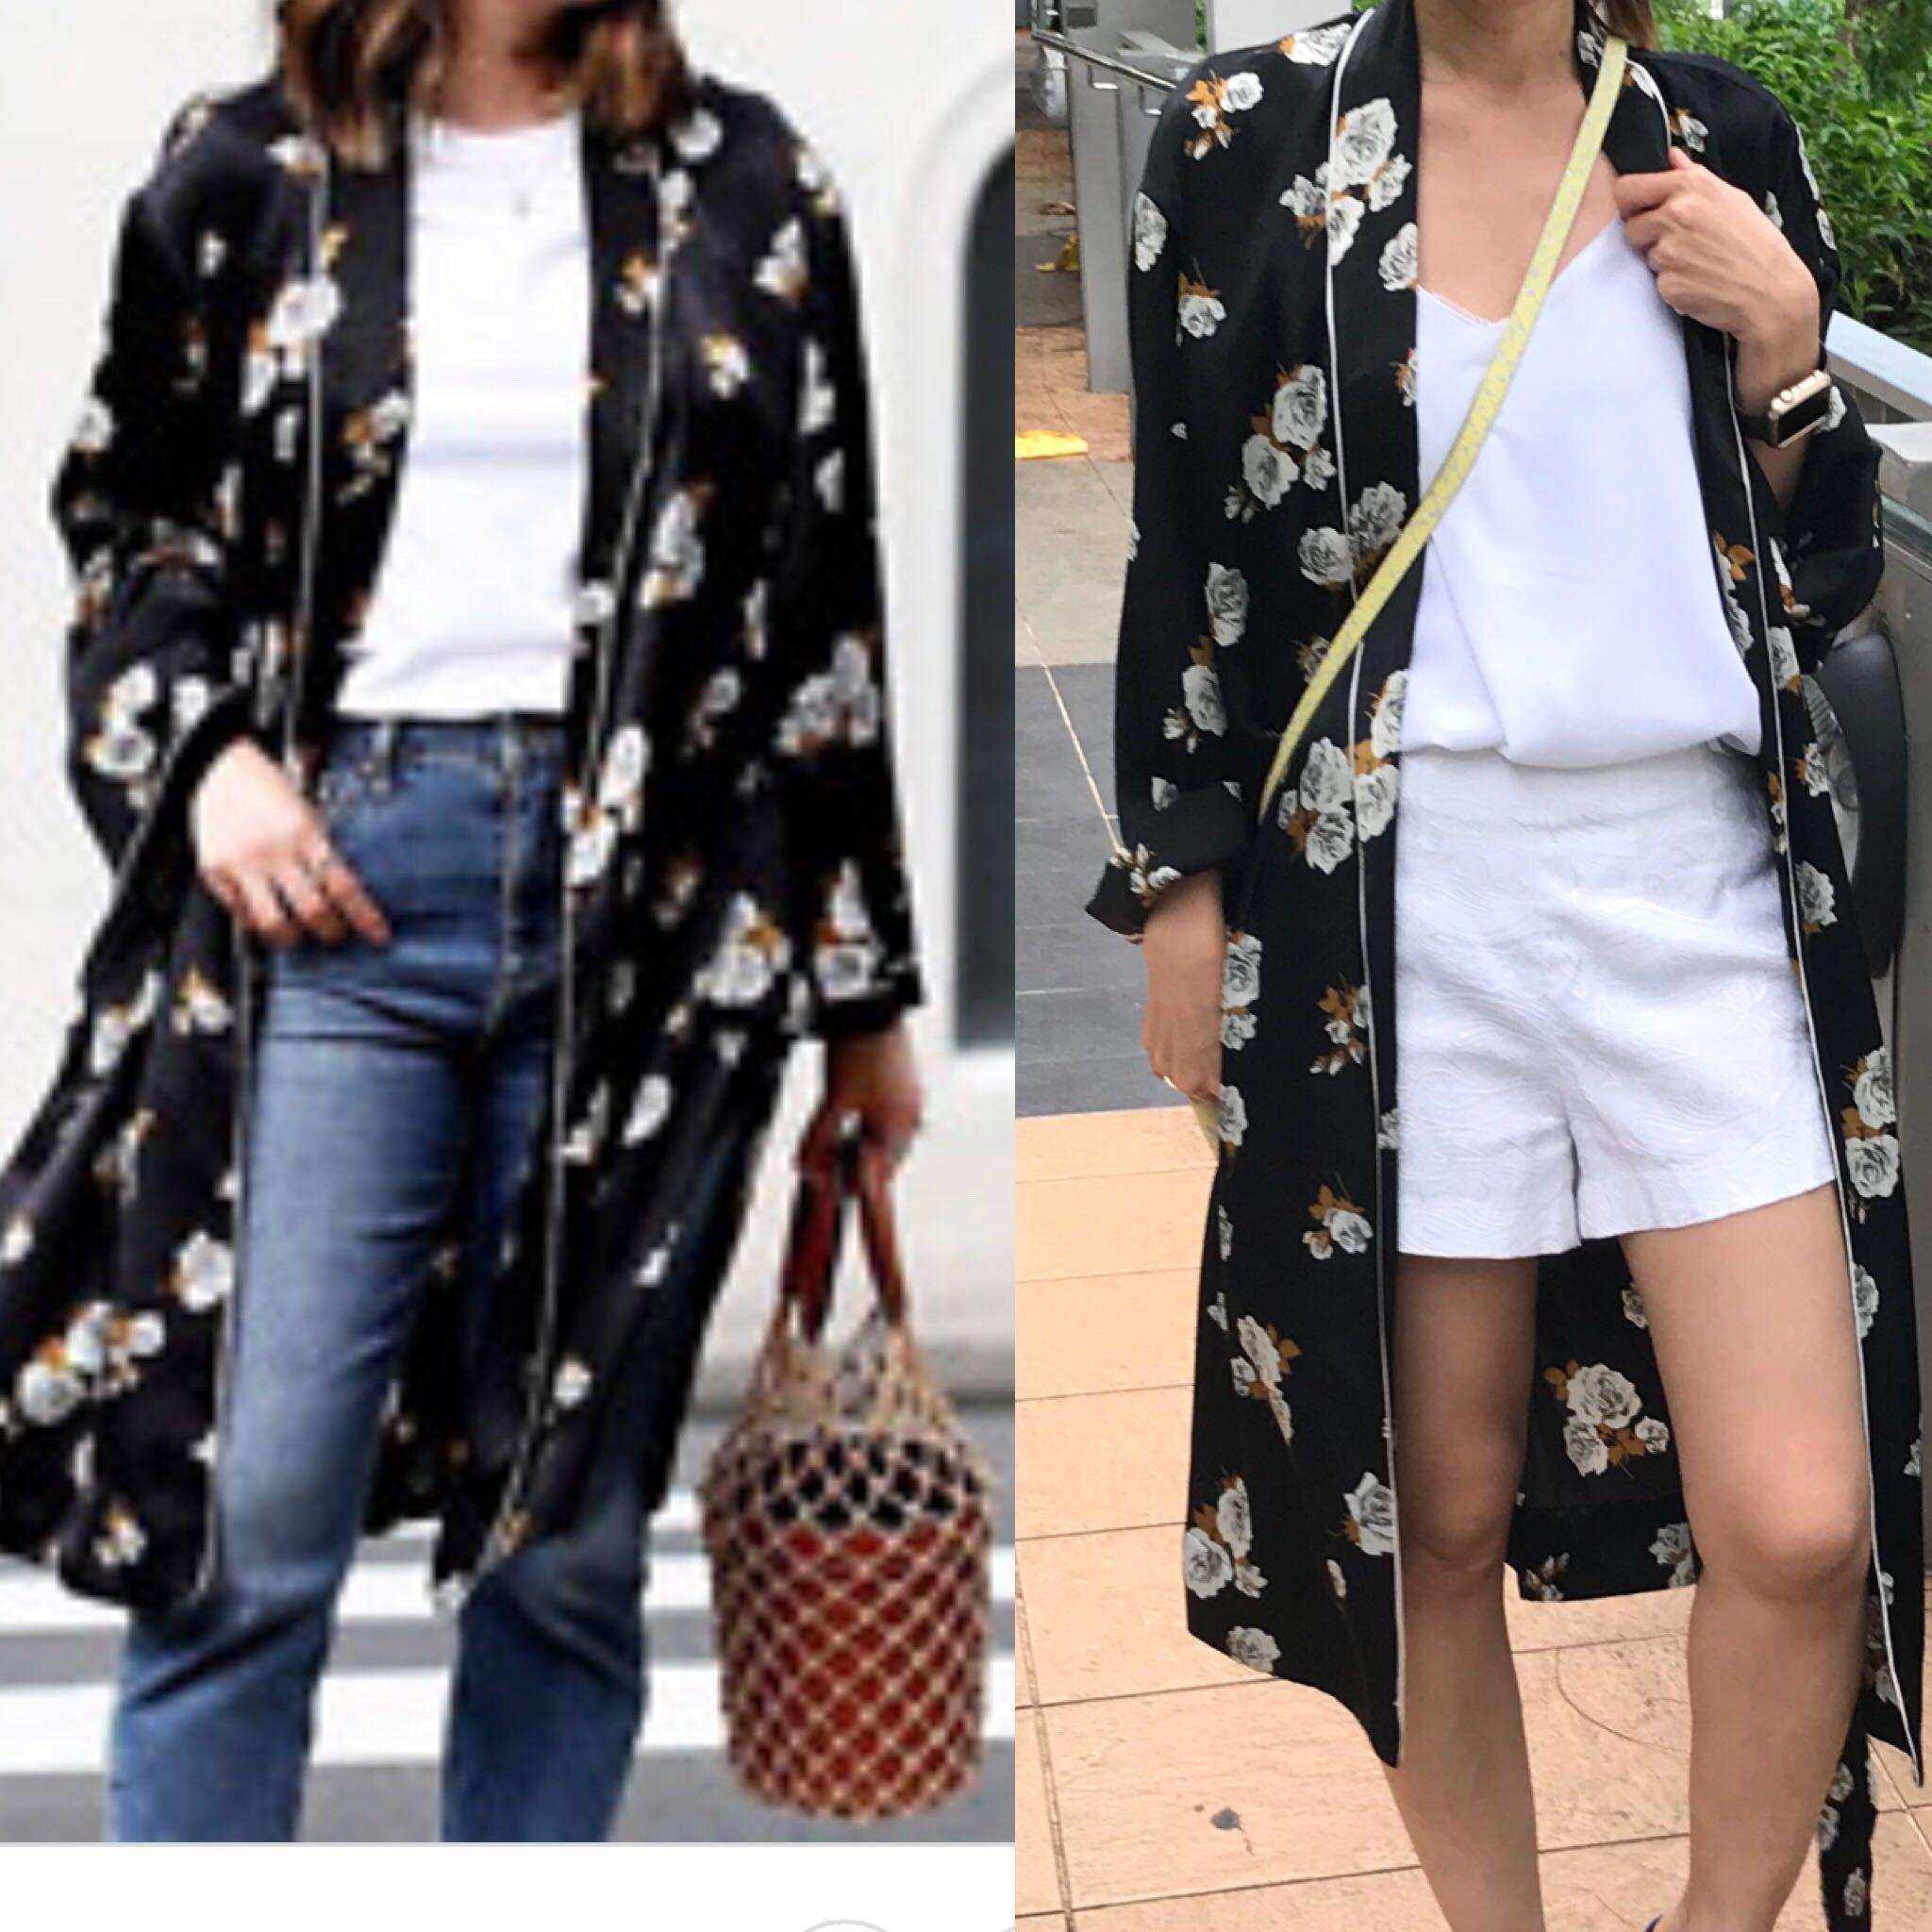 63a9cc1b5 Zara kimono floral dress, Women's Fashion, Clothes, Outerwear on ...